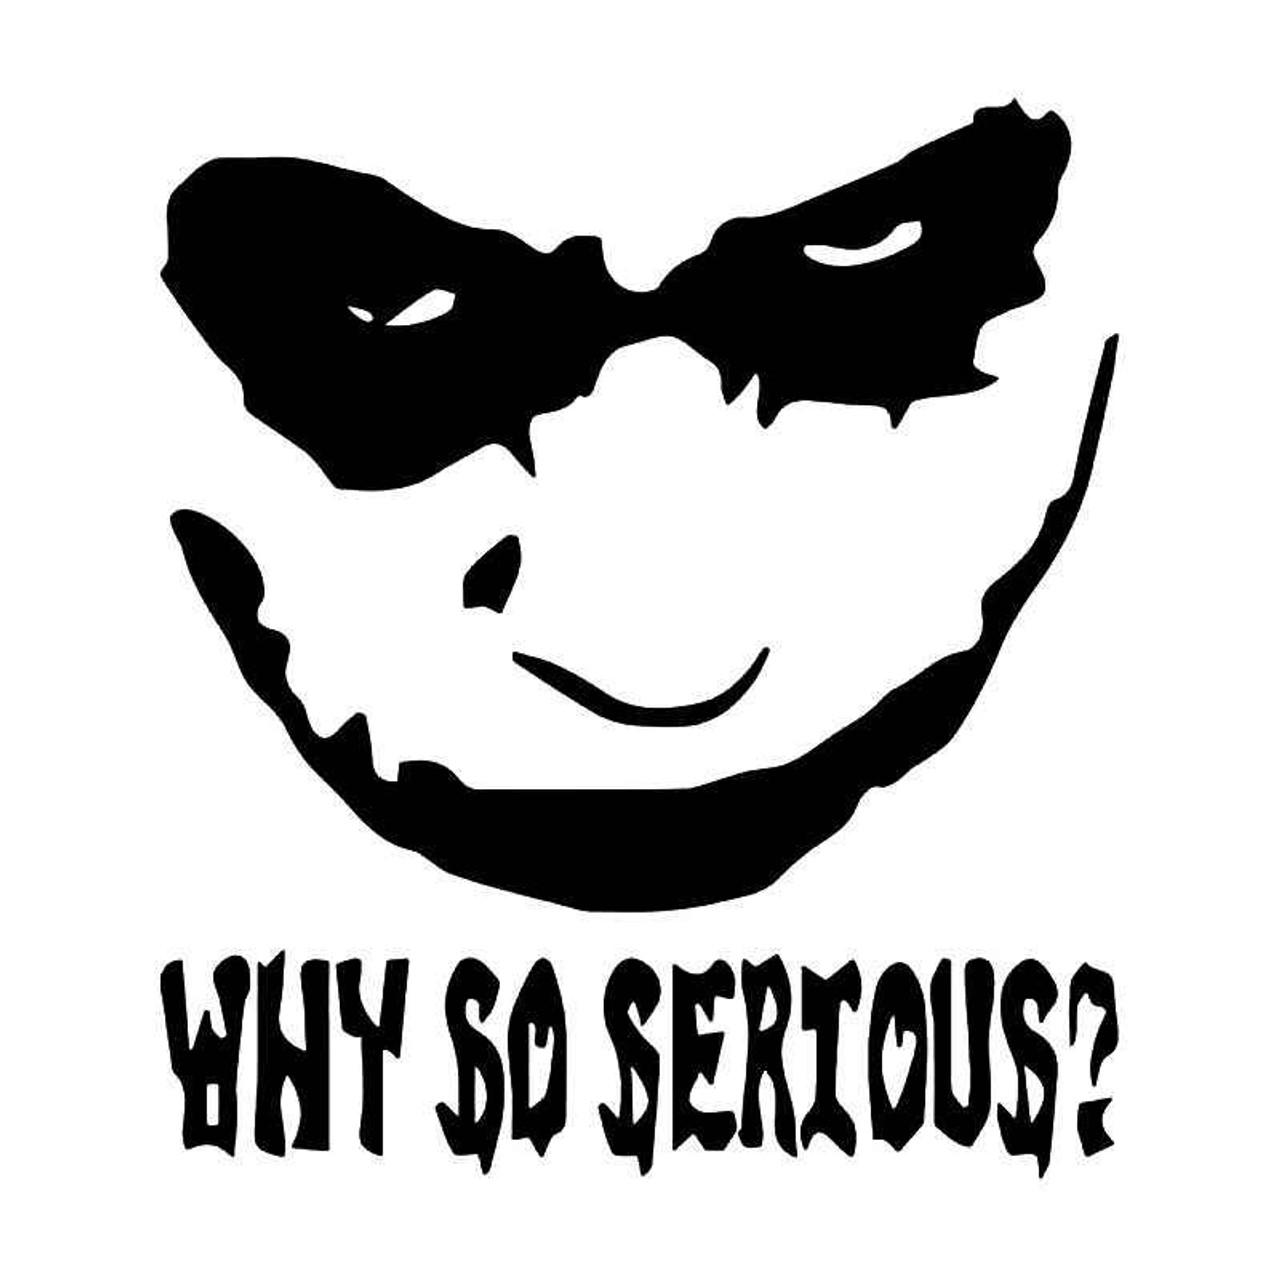 878d54682 The Joker Why So Serious 3 Vinyl Sticker